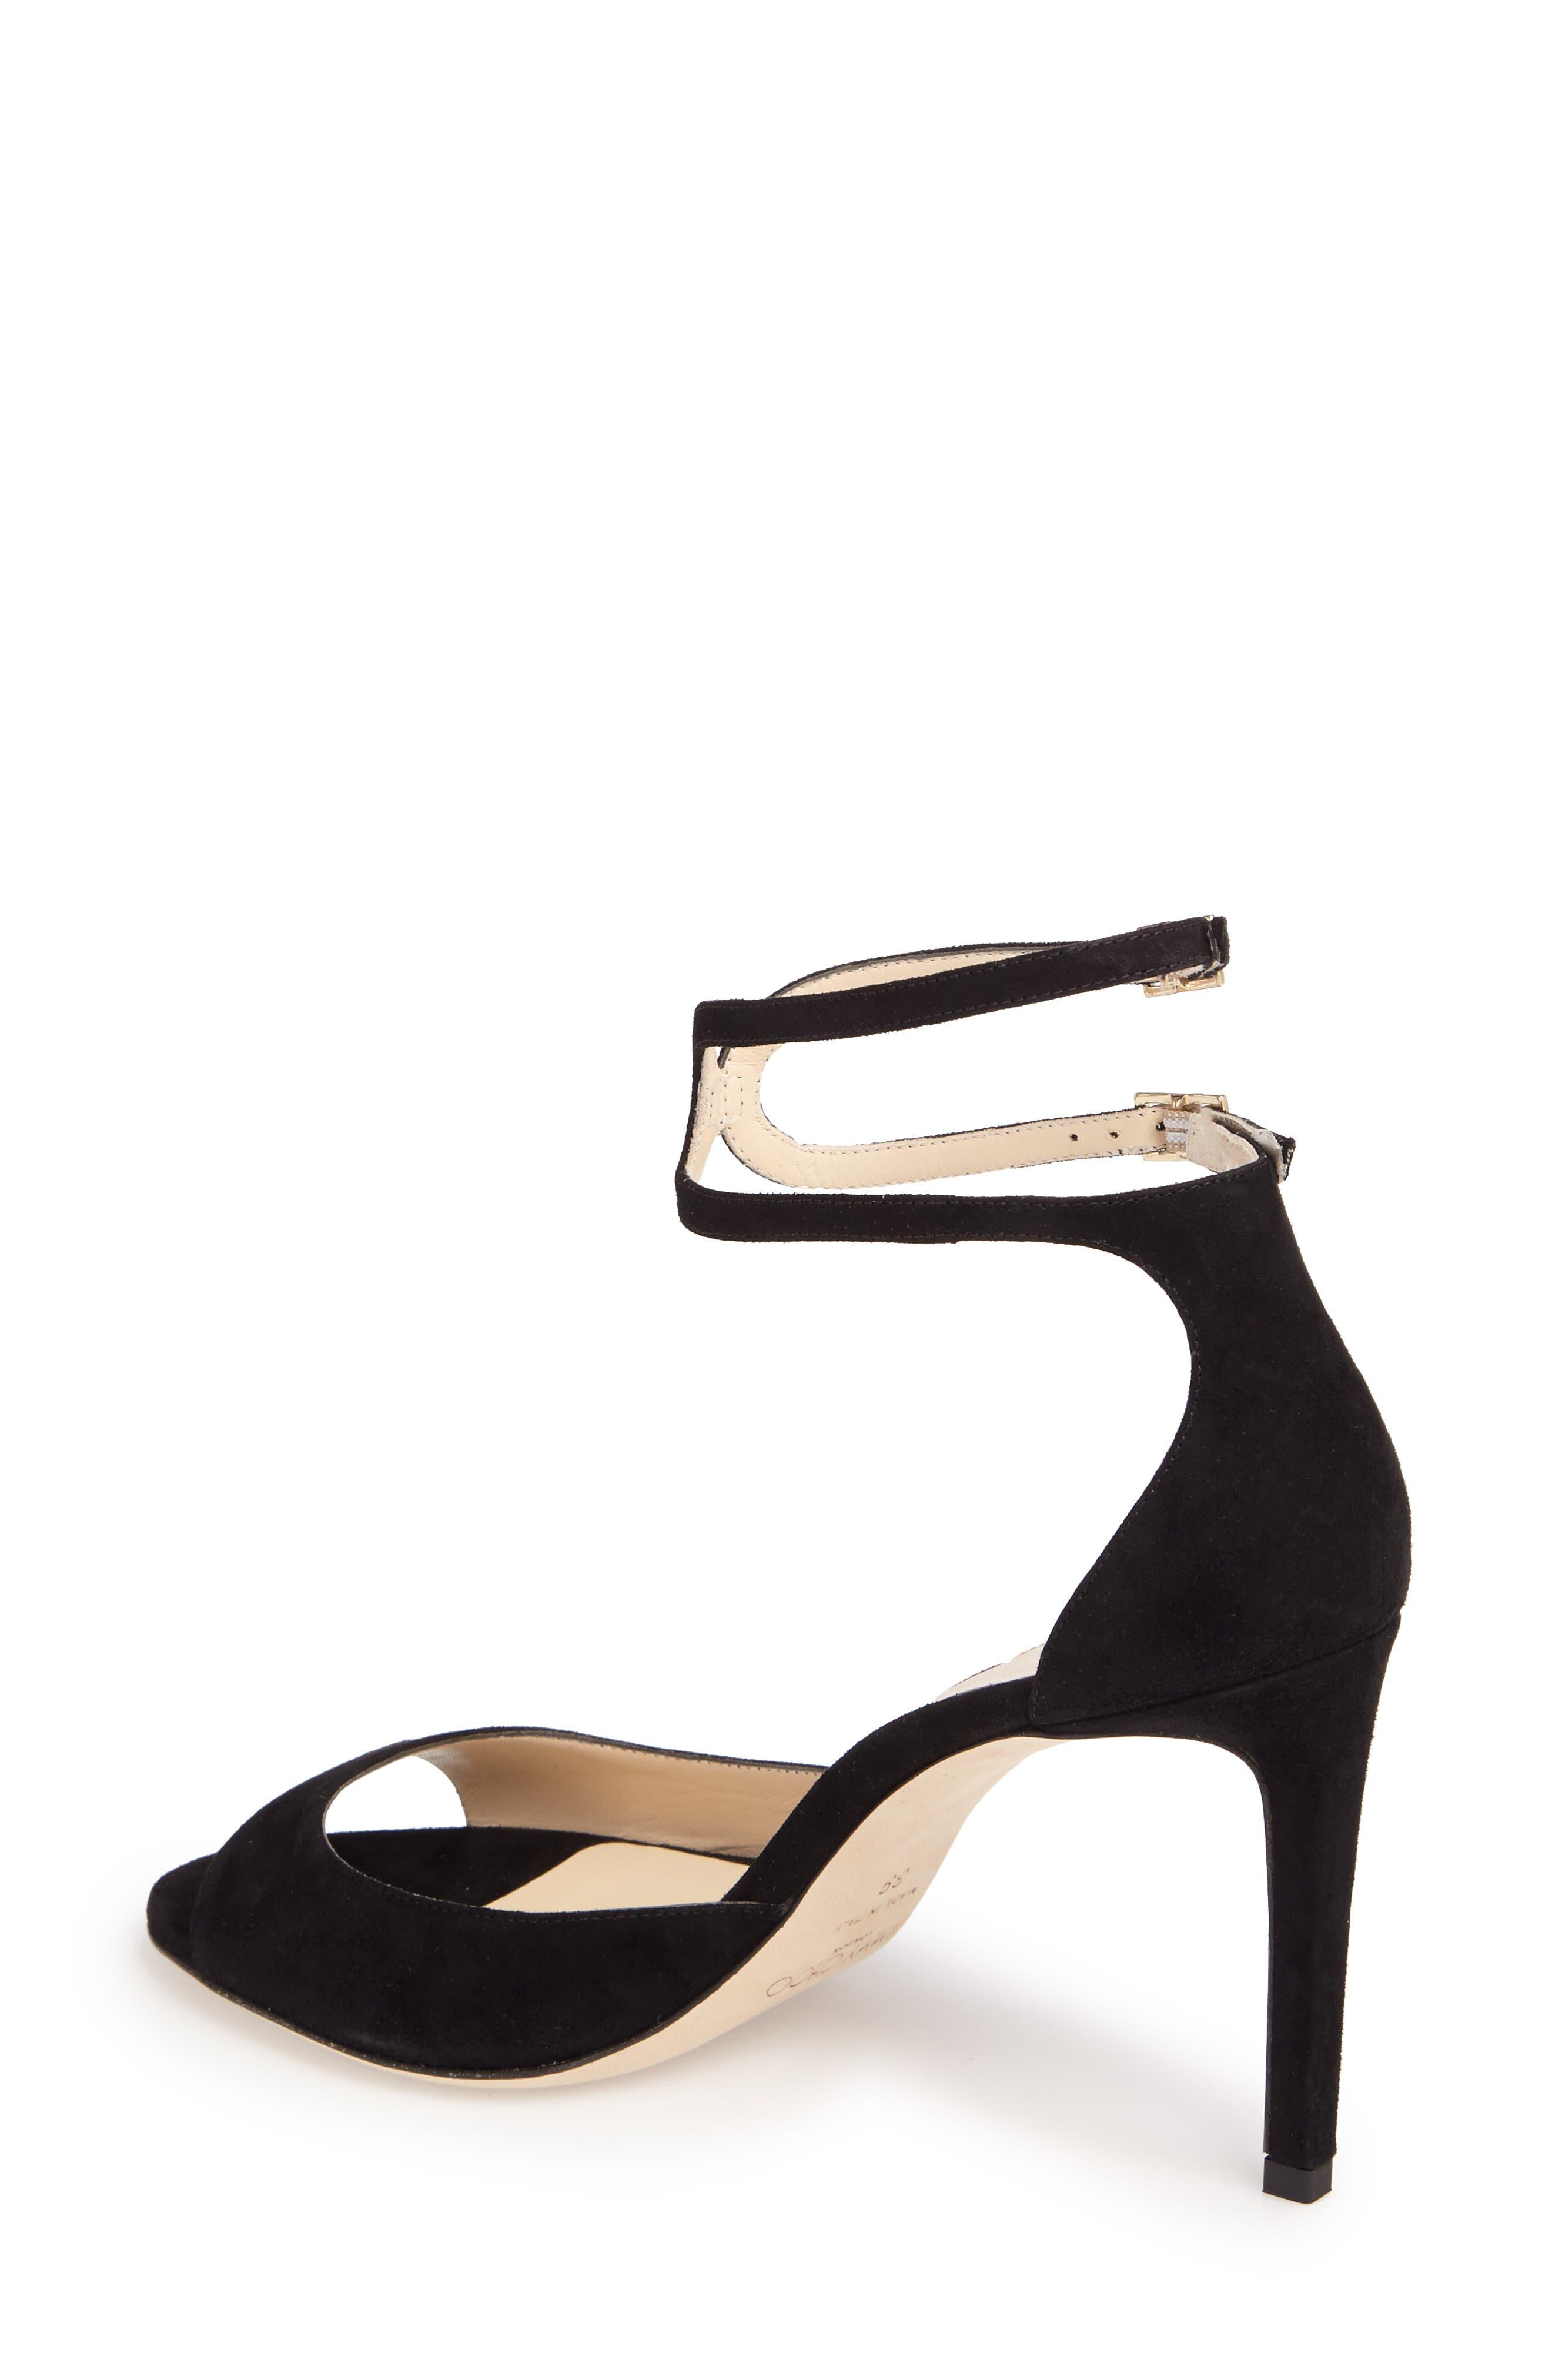 Lane Sandal,                             Alternate thumbnail 2, color,                             BLACK